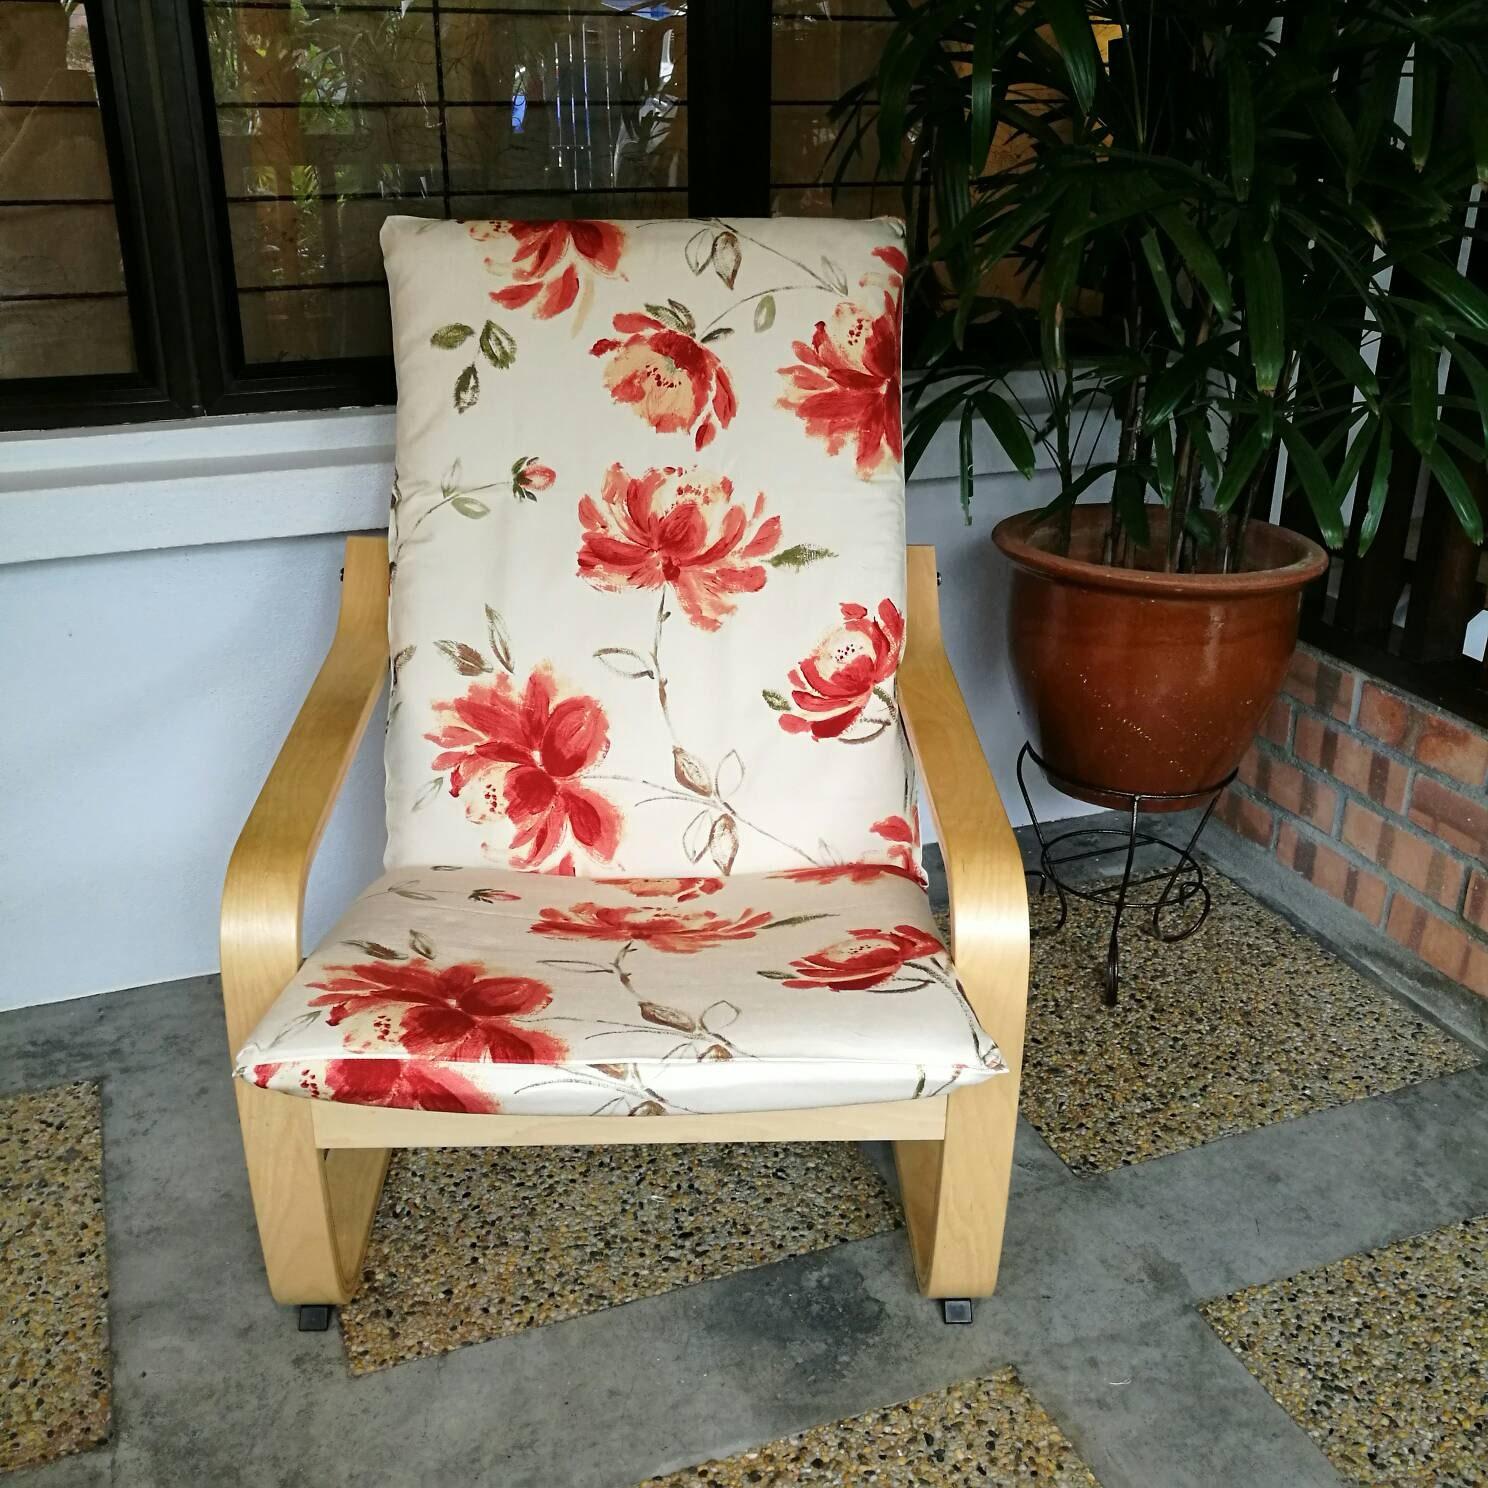 Ikea Poang Chair Cushion Cover Floral Print